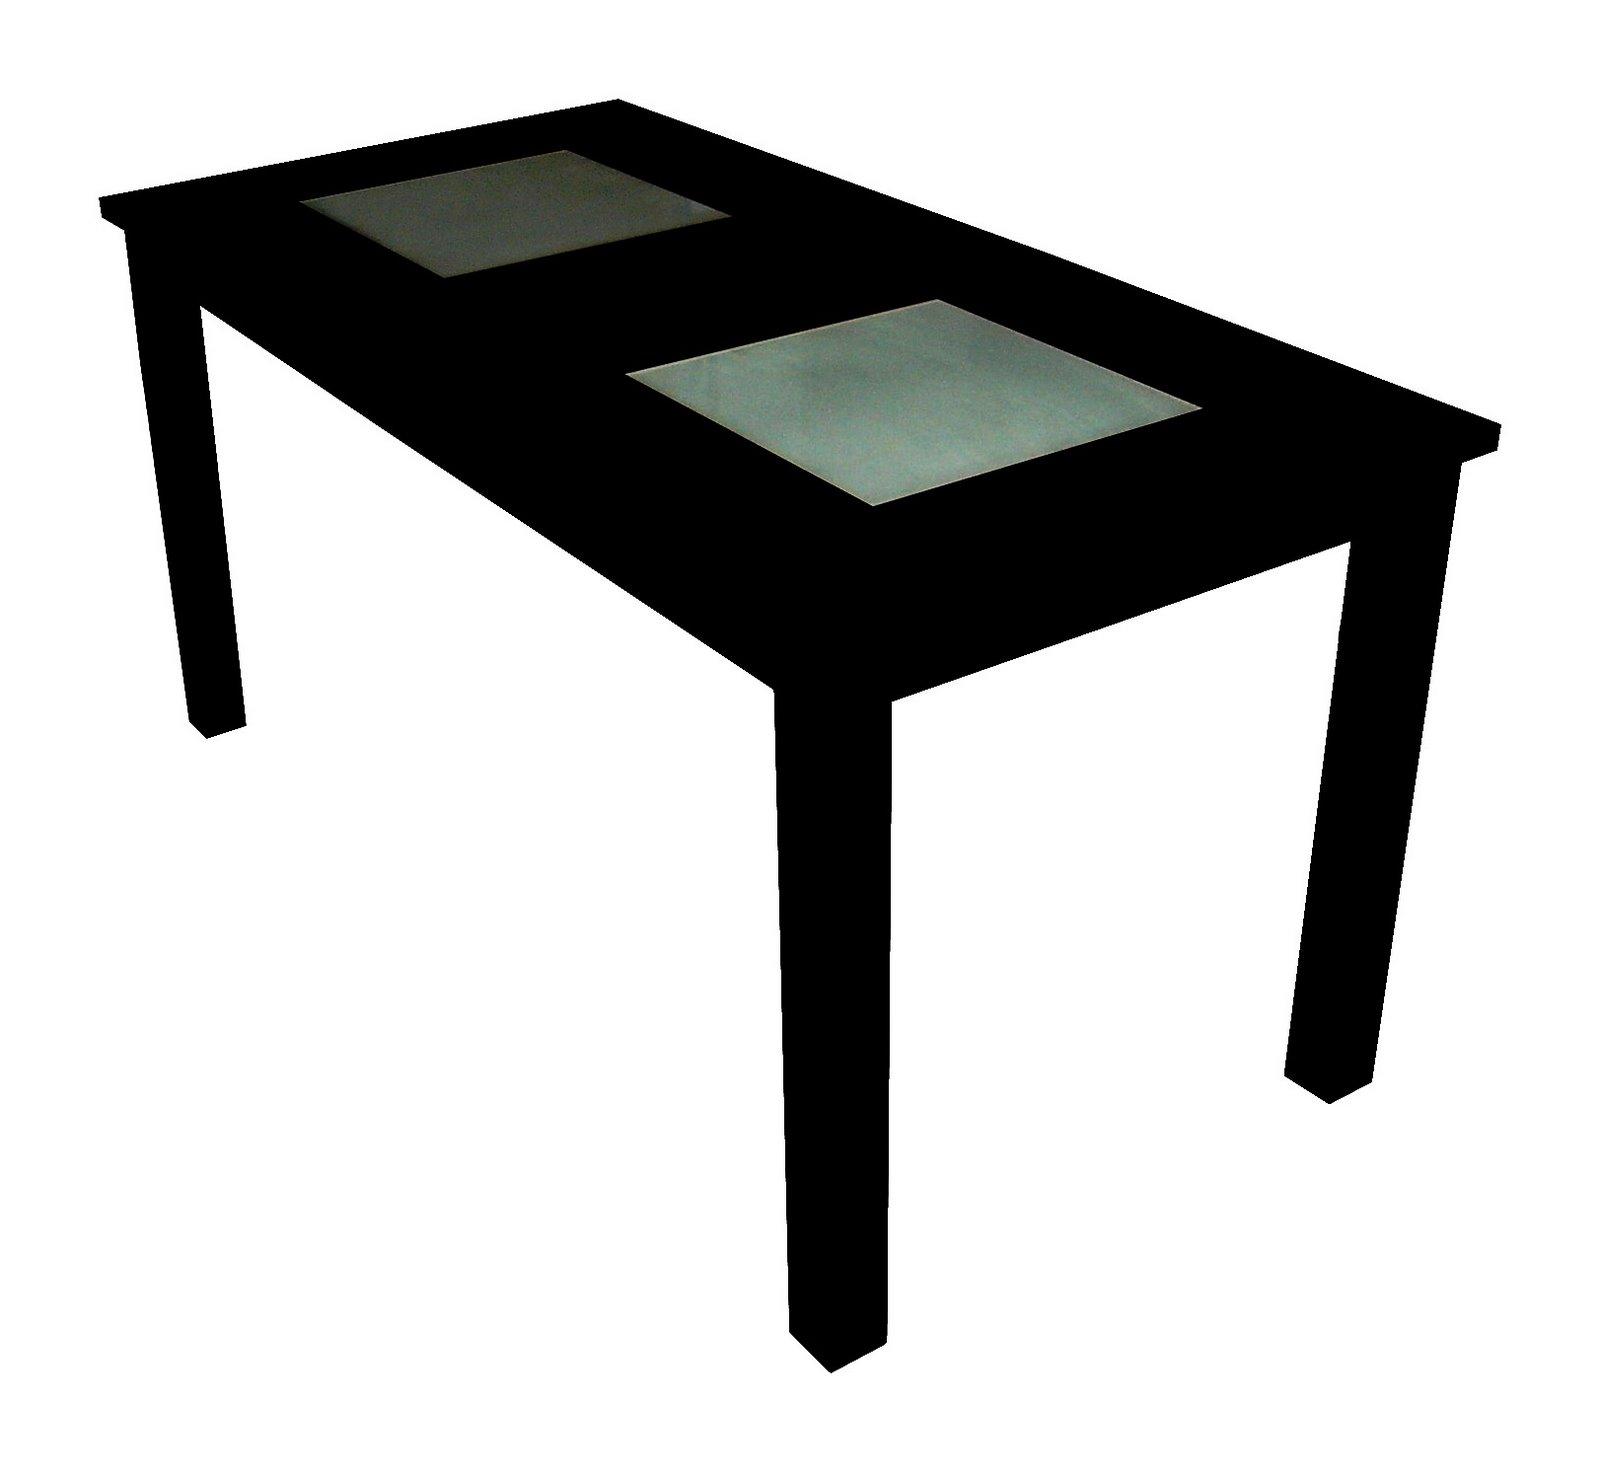 macizo galvanizado tapa de madera o de vidrio tapa de melamina en ud muebles madera y vidrio